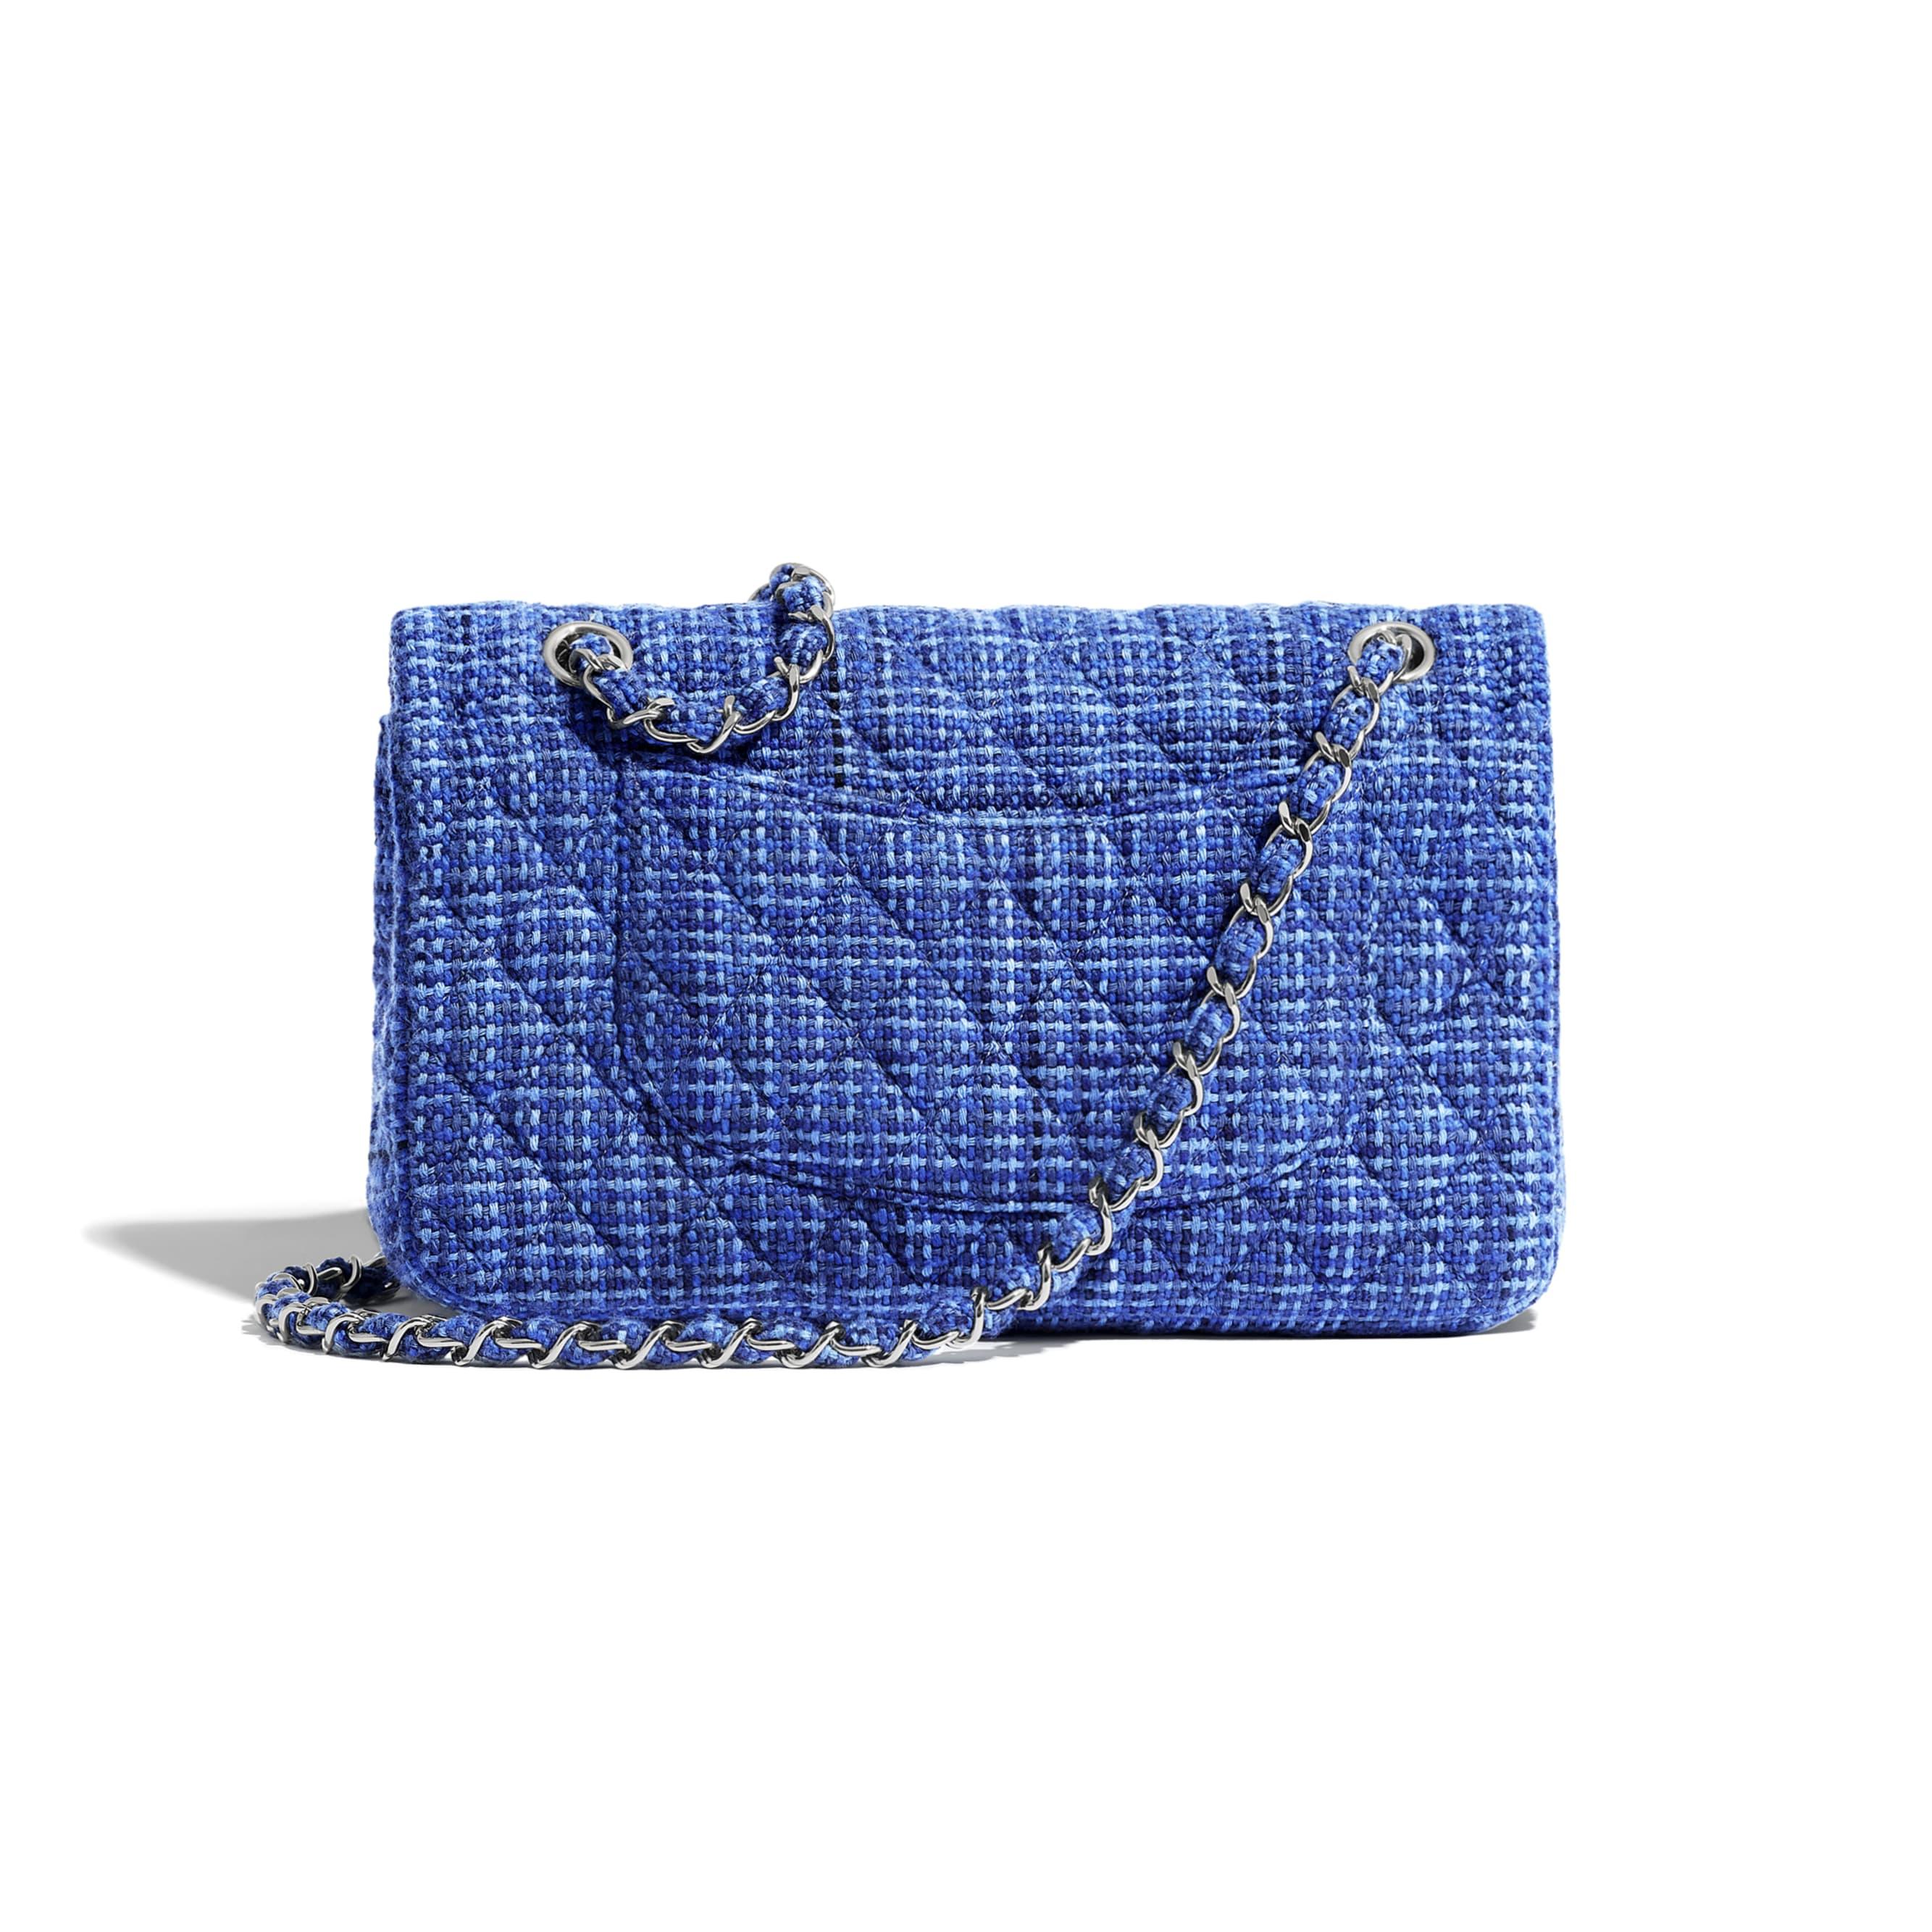 Classic Handbag - Navy Blue & Blue - Tweed & Silver-Tone Metal - CHANEL - Alternative view - see standard sized version